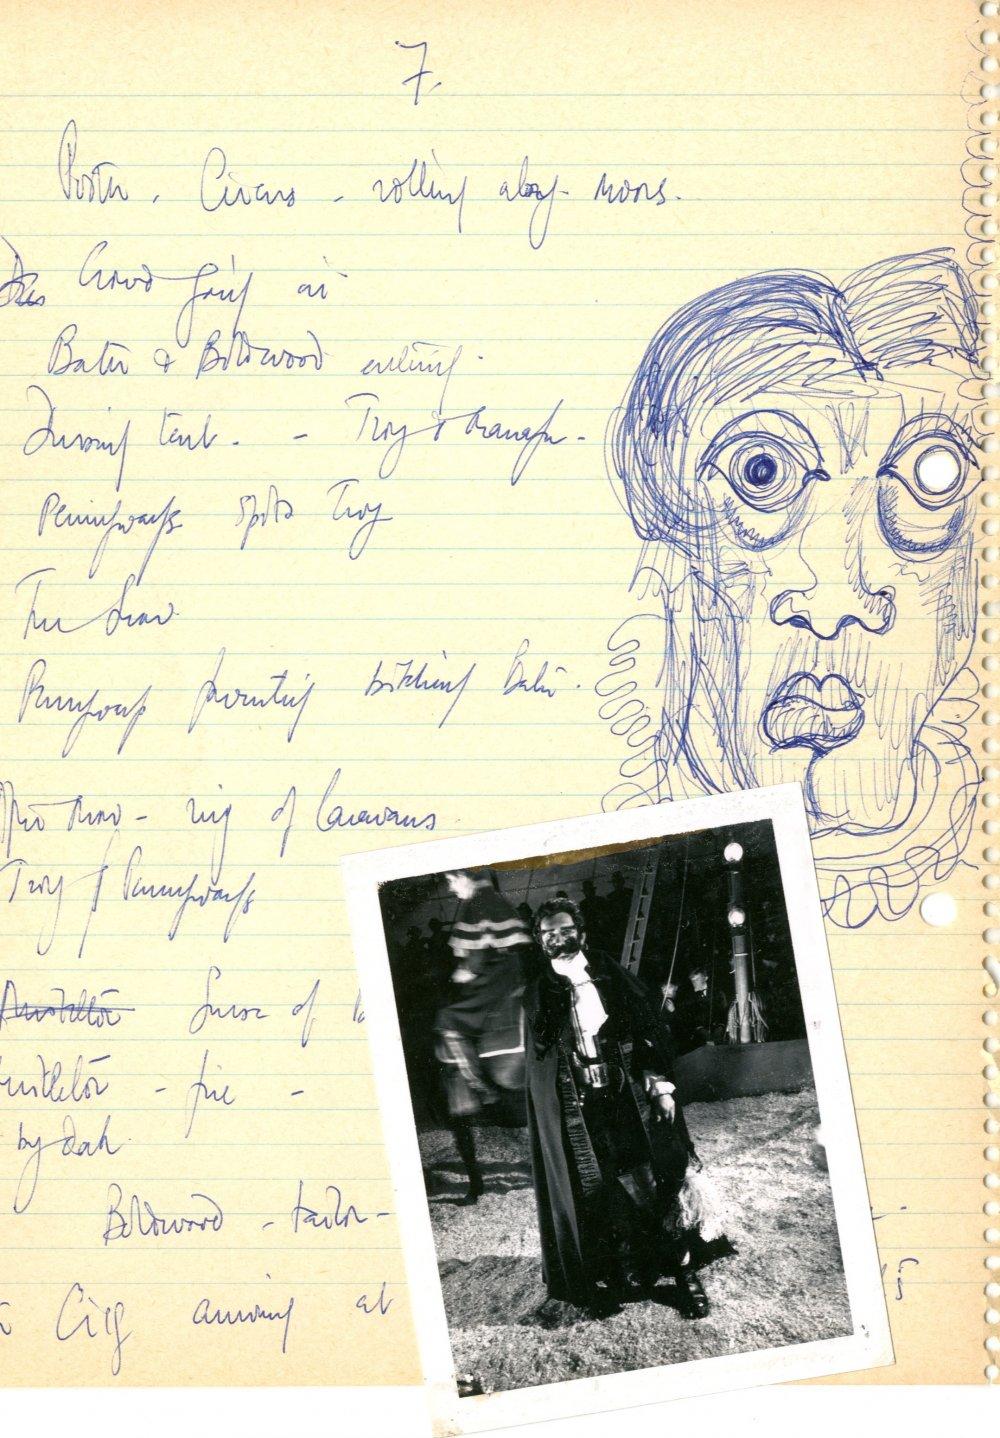 Schlesinger's handwritten and illustrated scene breakdown, alongside a continuity polaroid of Troy as Turpin